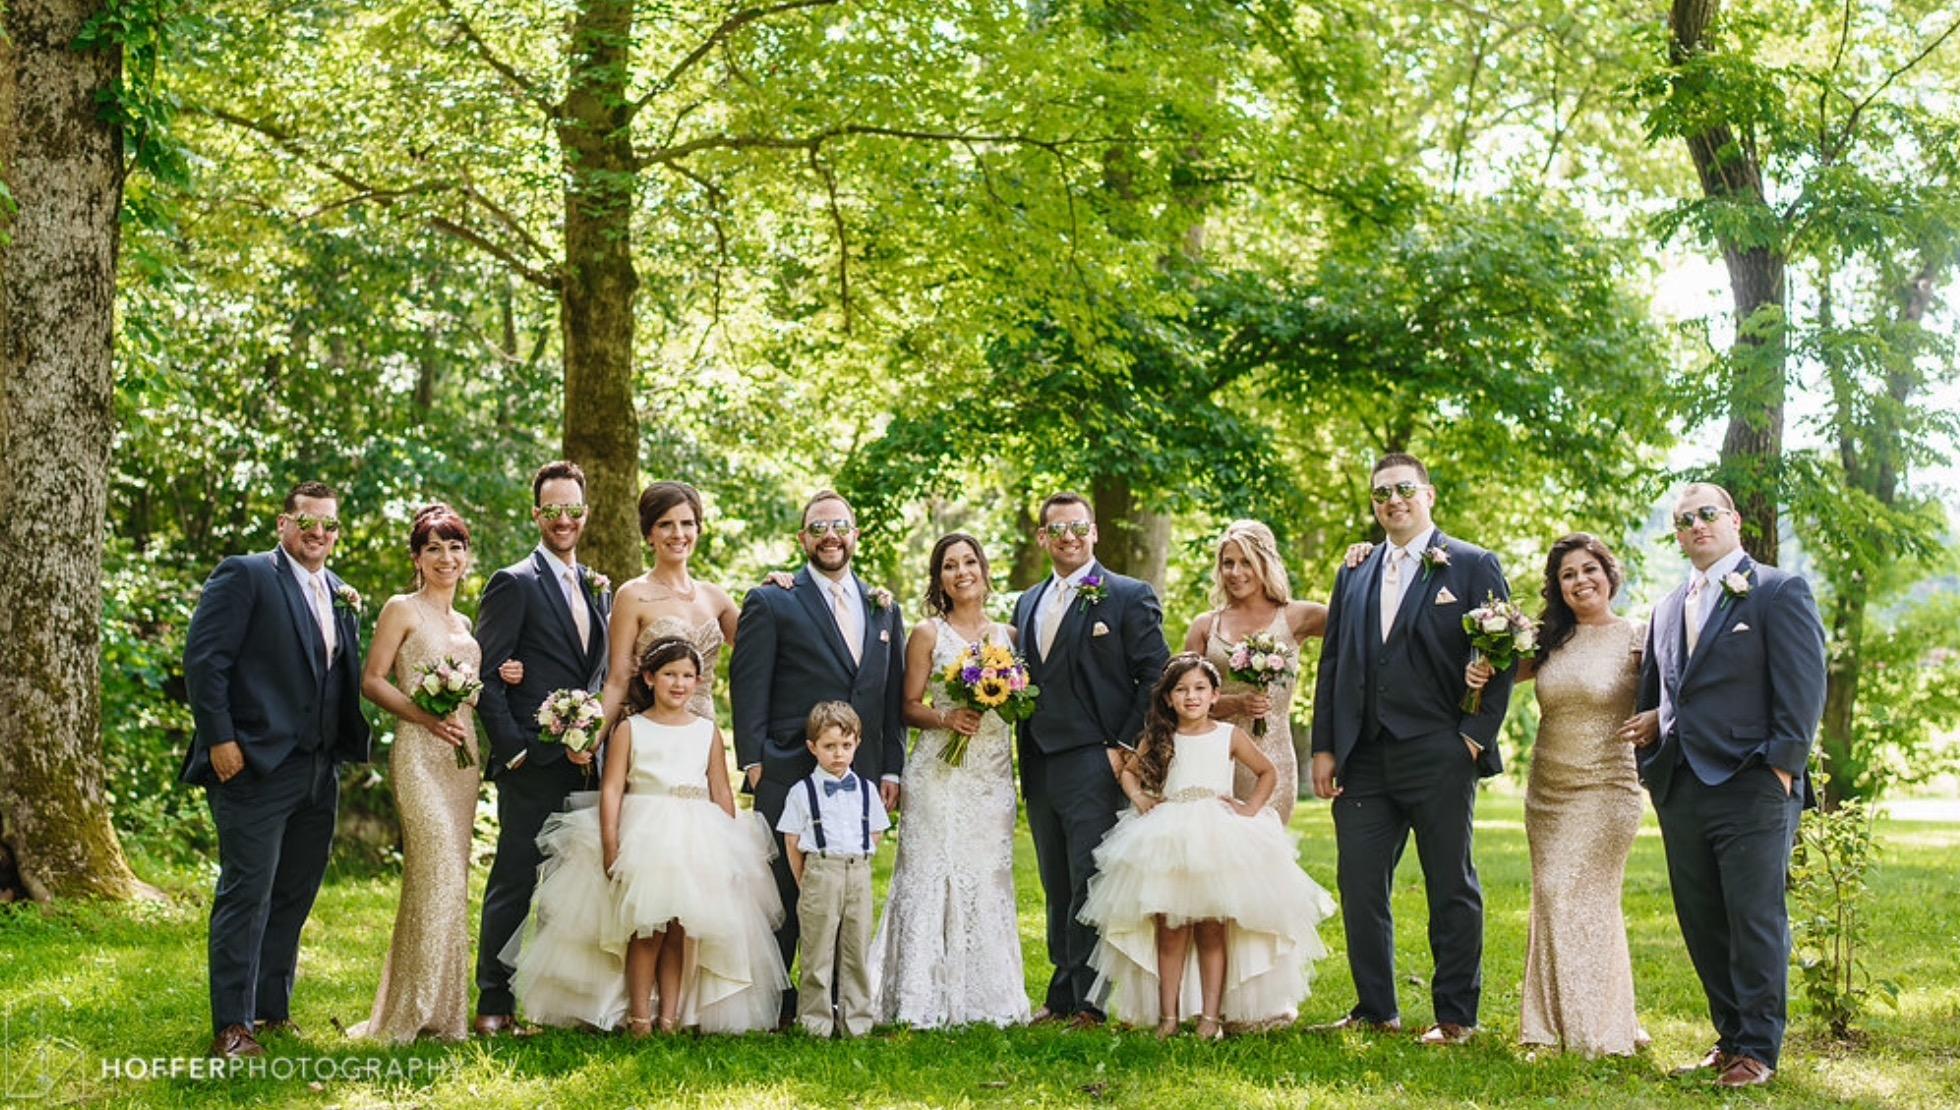 Groom and groomsmen slate blue slim fit tuxedos